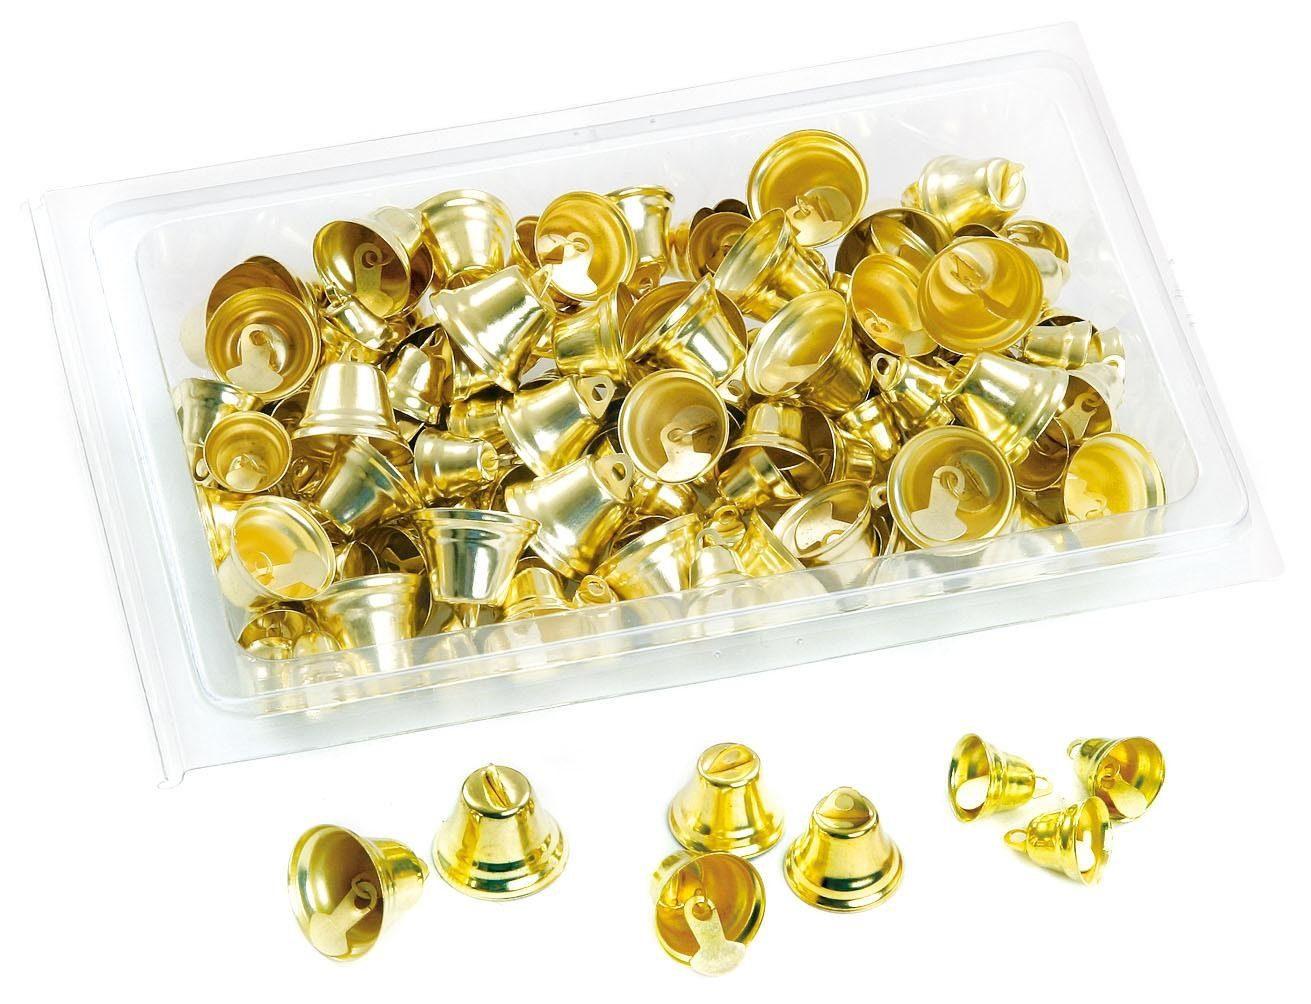 Glöckchen-Sortiment, 140 Stück, goldfarben